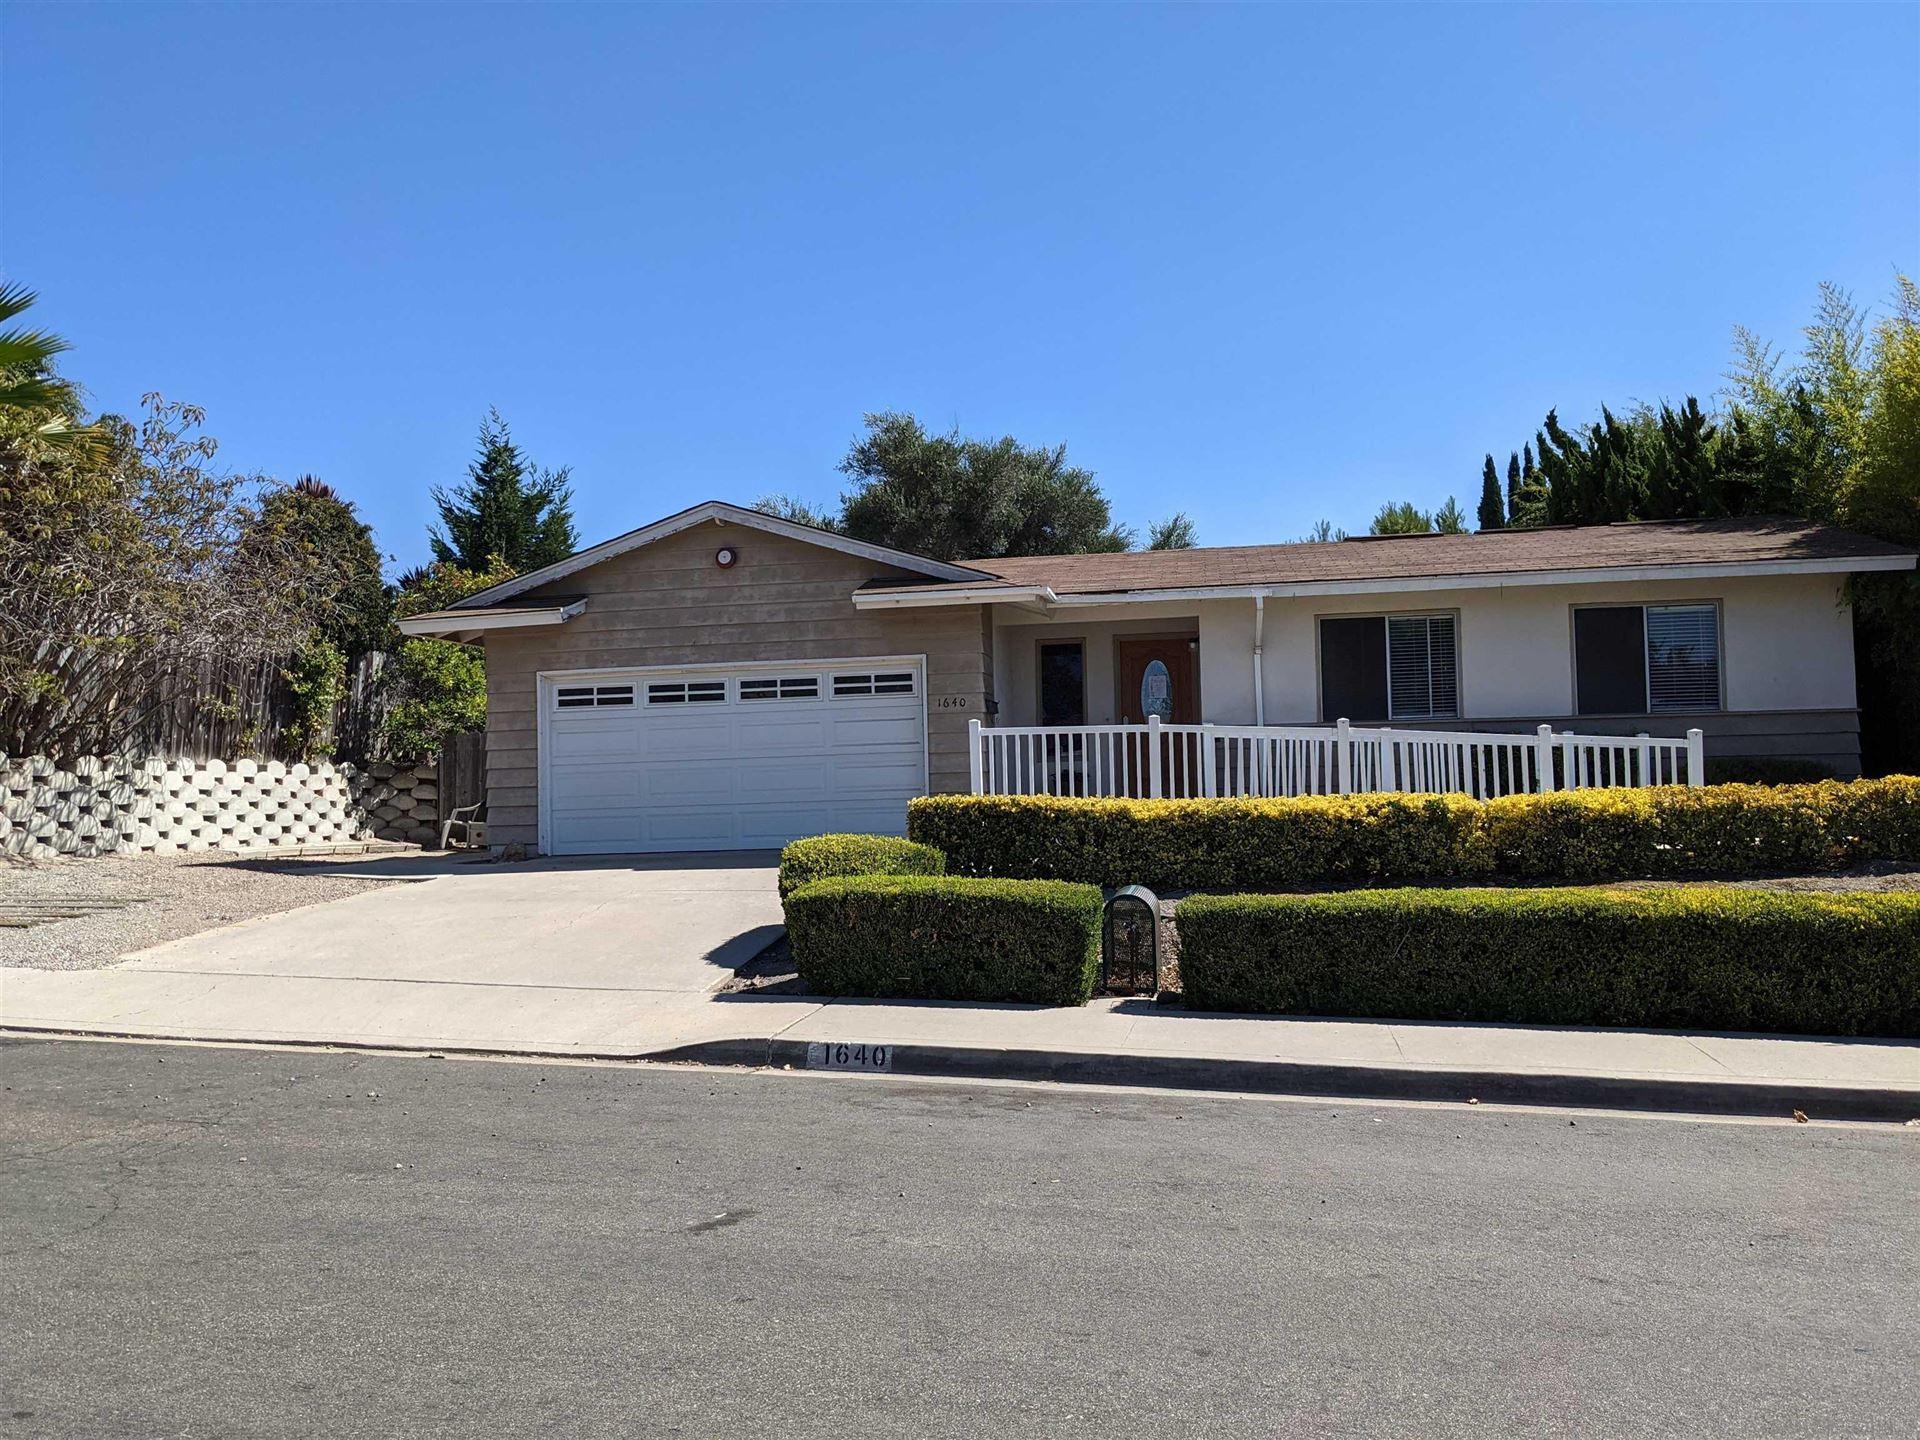 1640 Dartmouth St, Chula Vista, CA 91913 - MLS#: 210026654